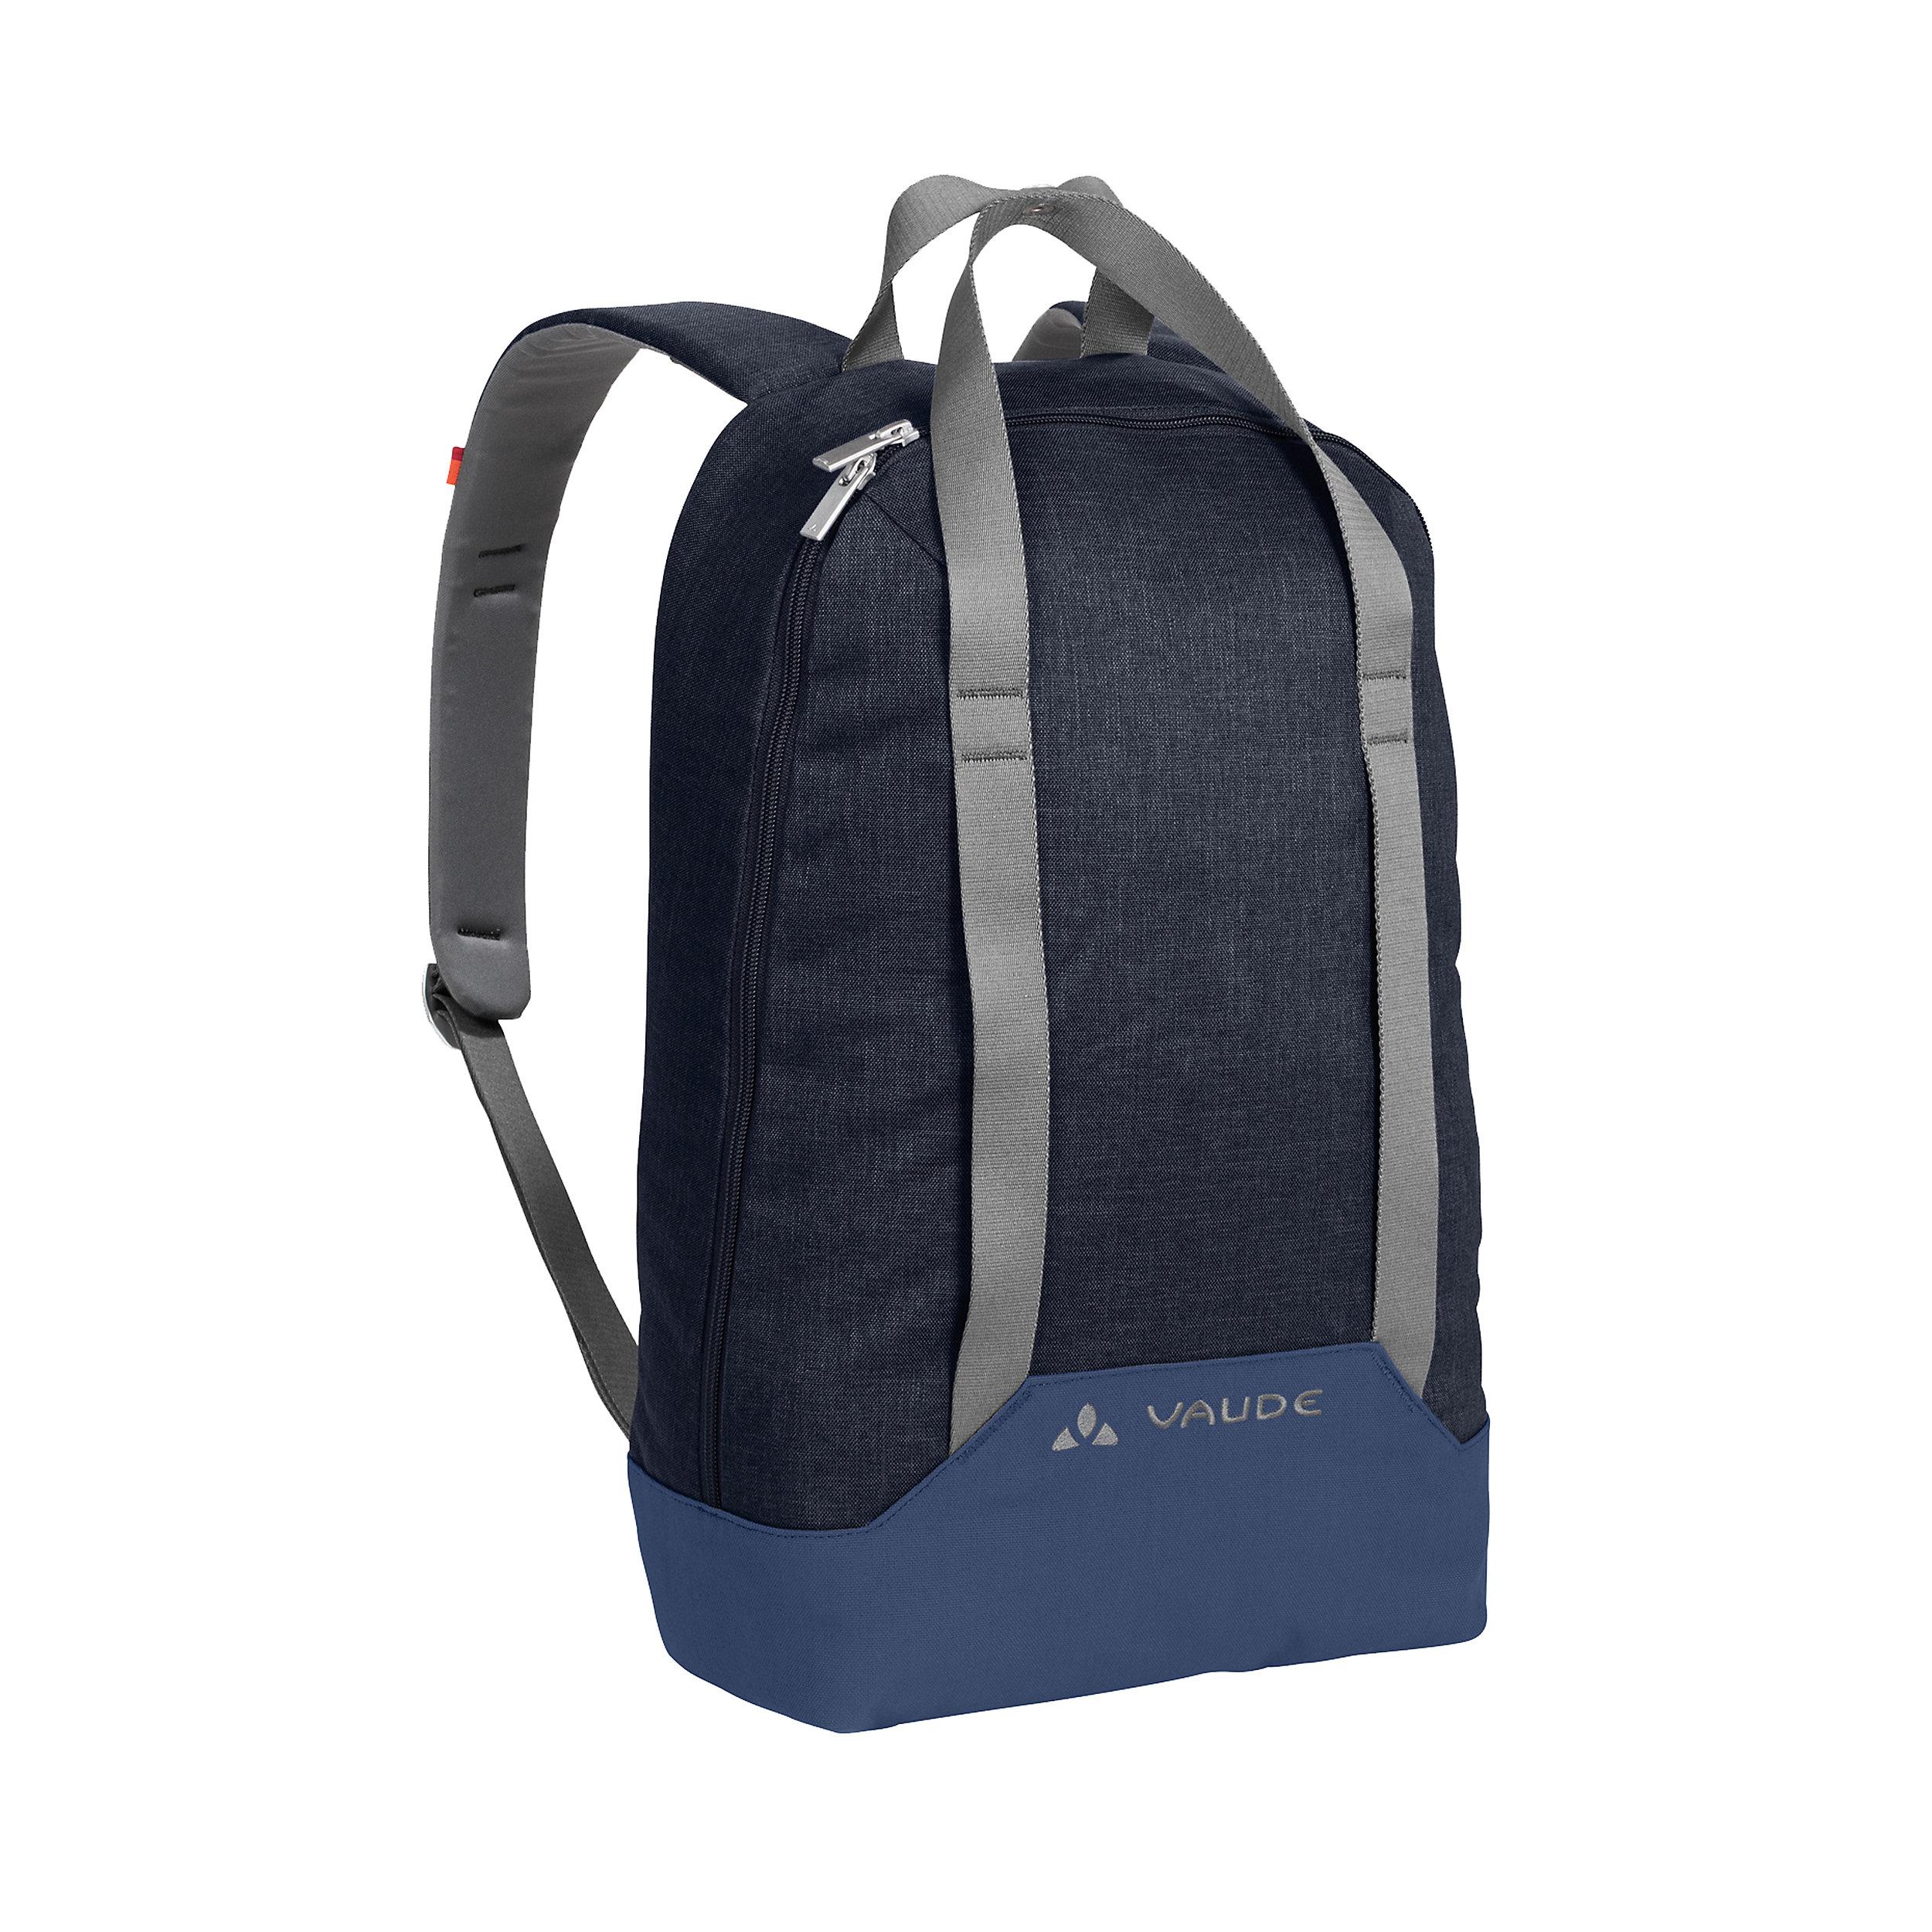 Backpack Comrade II Colleagues M 16 Liter